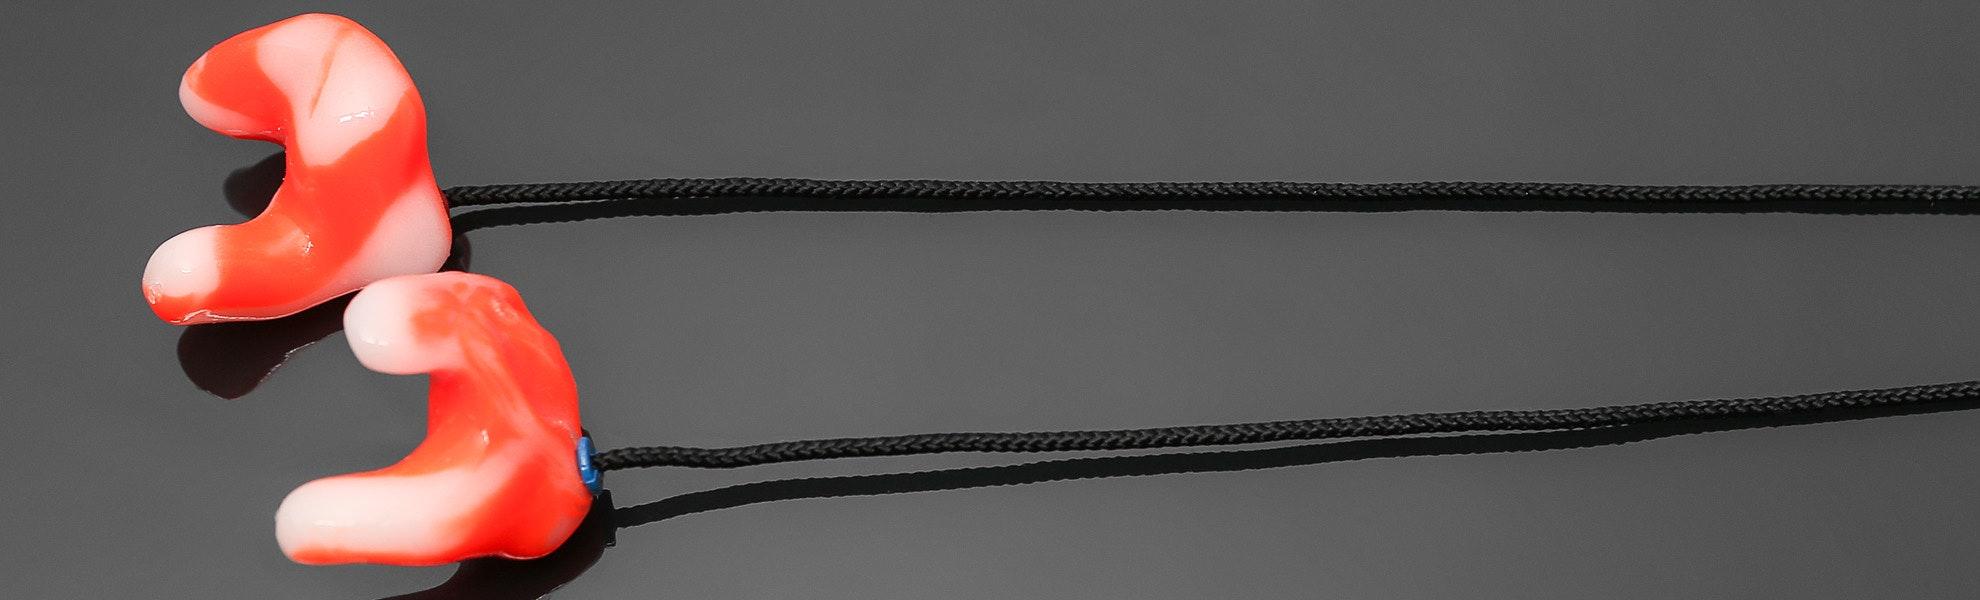 EAR Inc. Custom Audiophile Earplugs